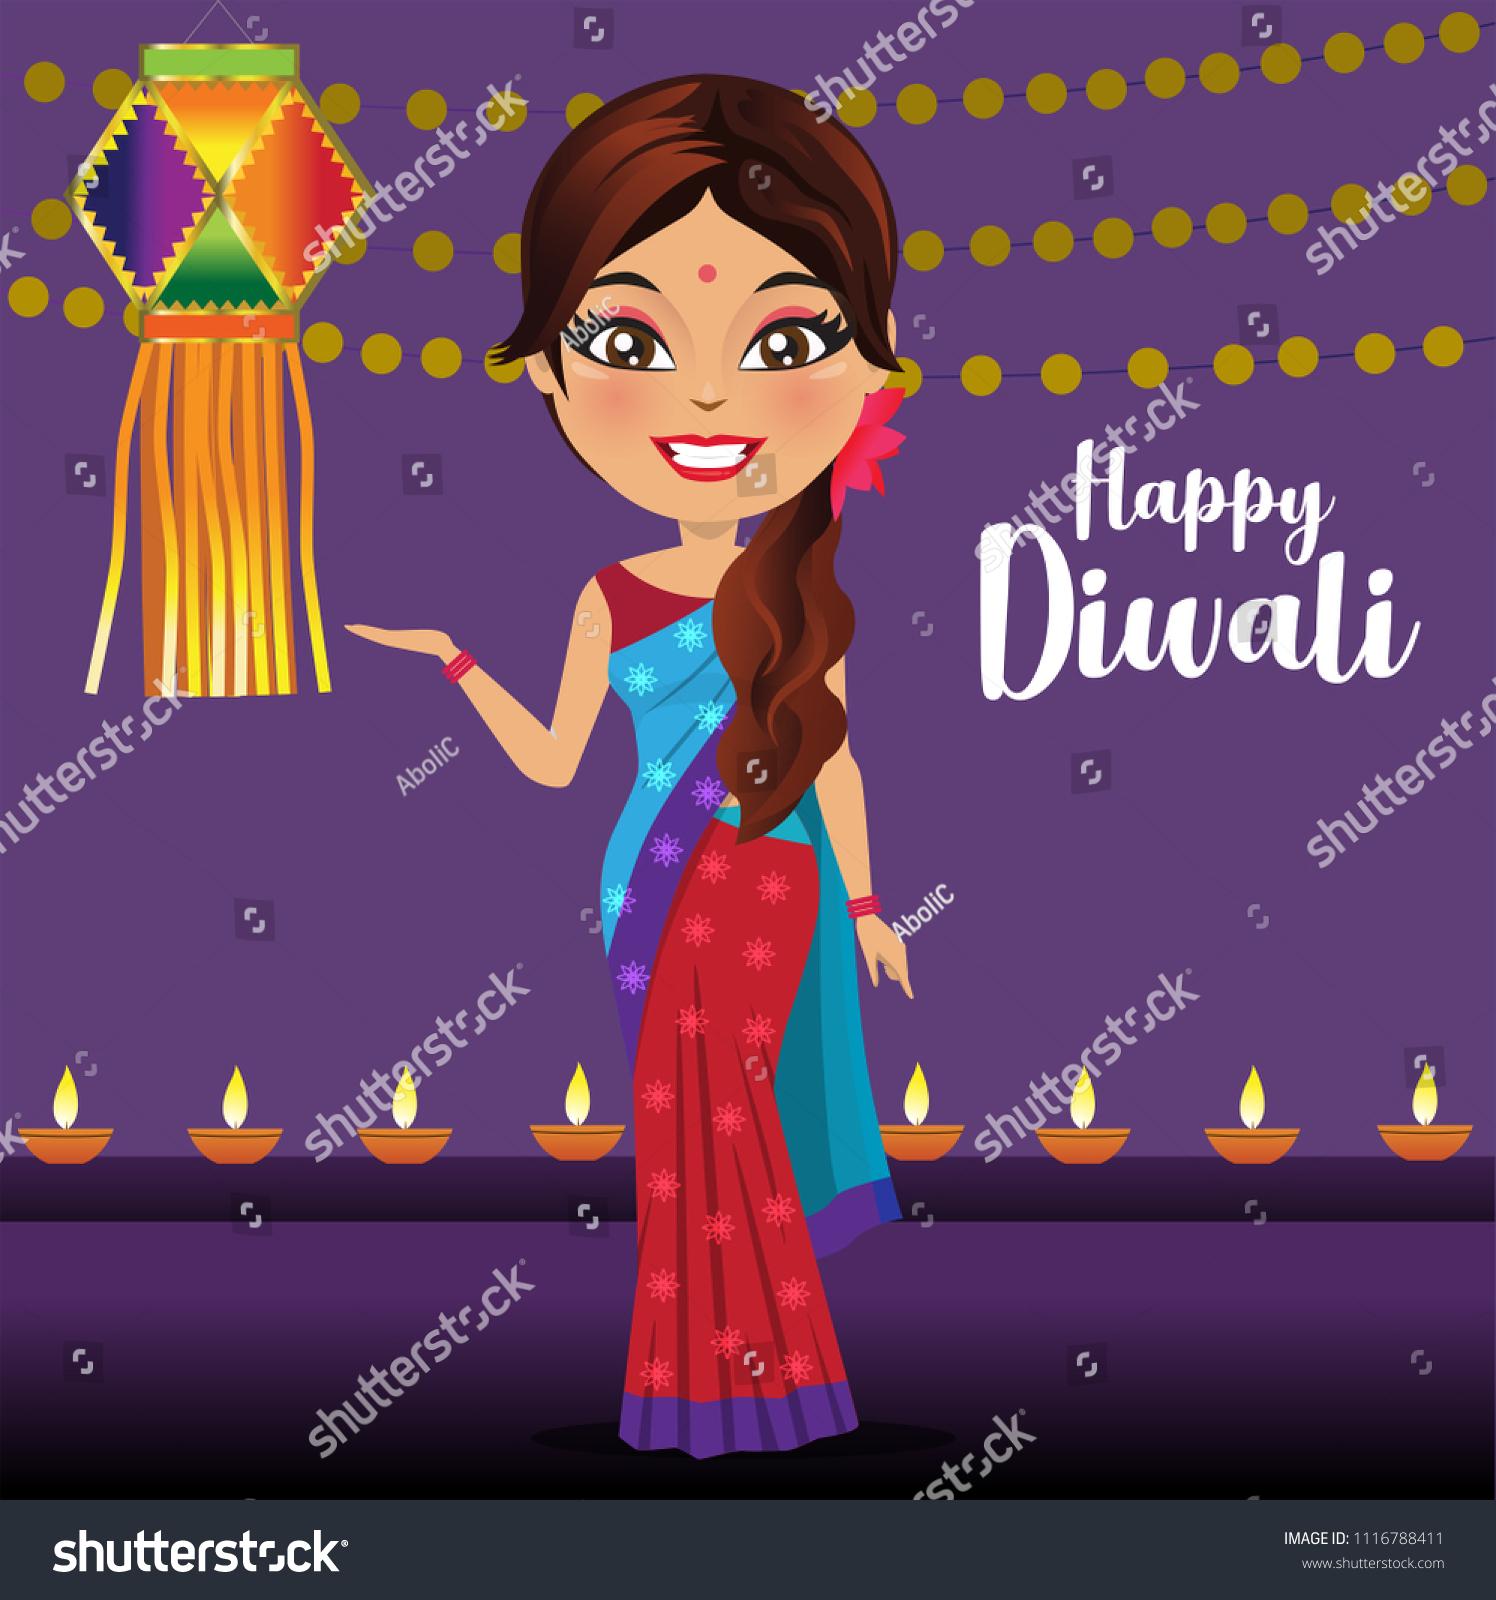 Indian Woman Giving Diwali Greetings Standing Stock Vector Royalty